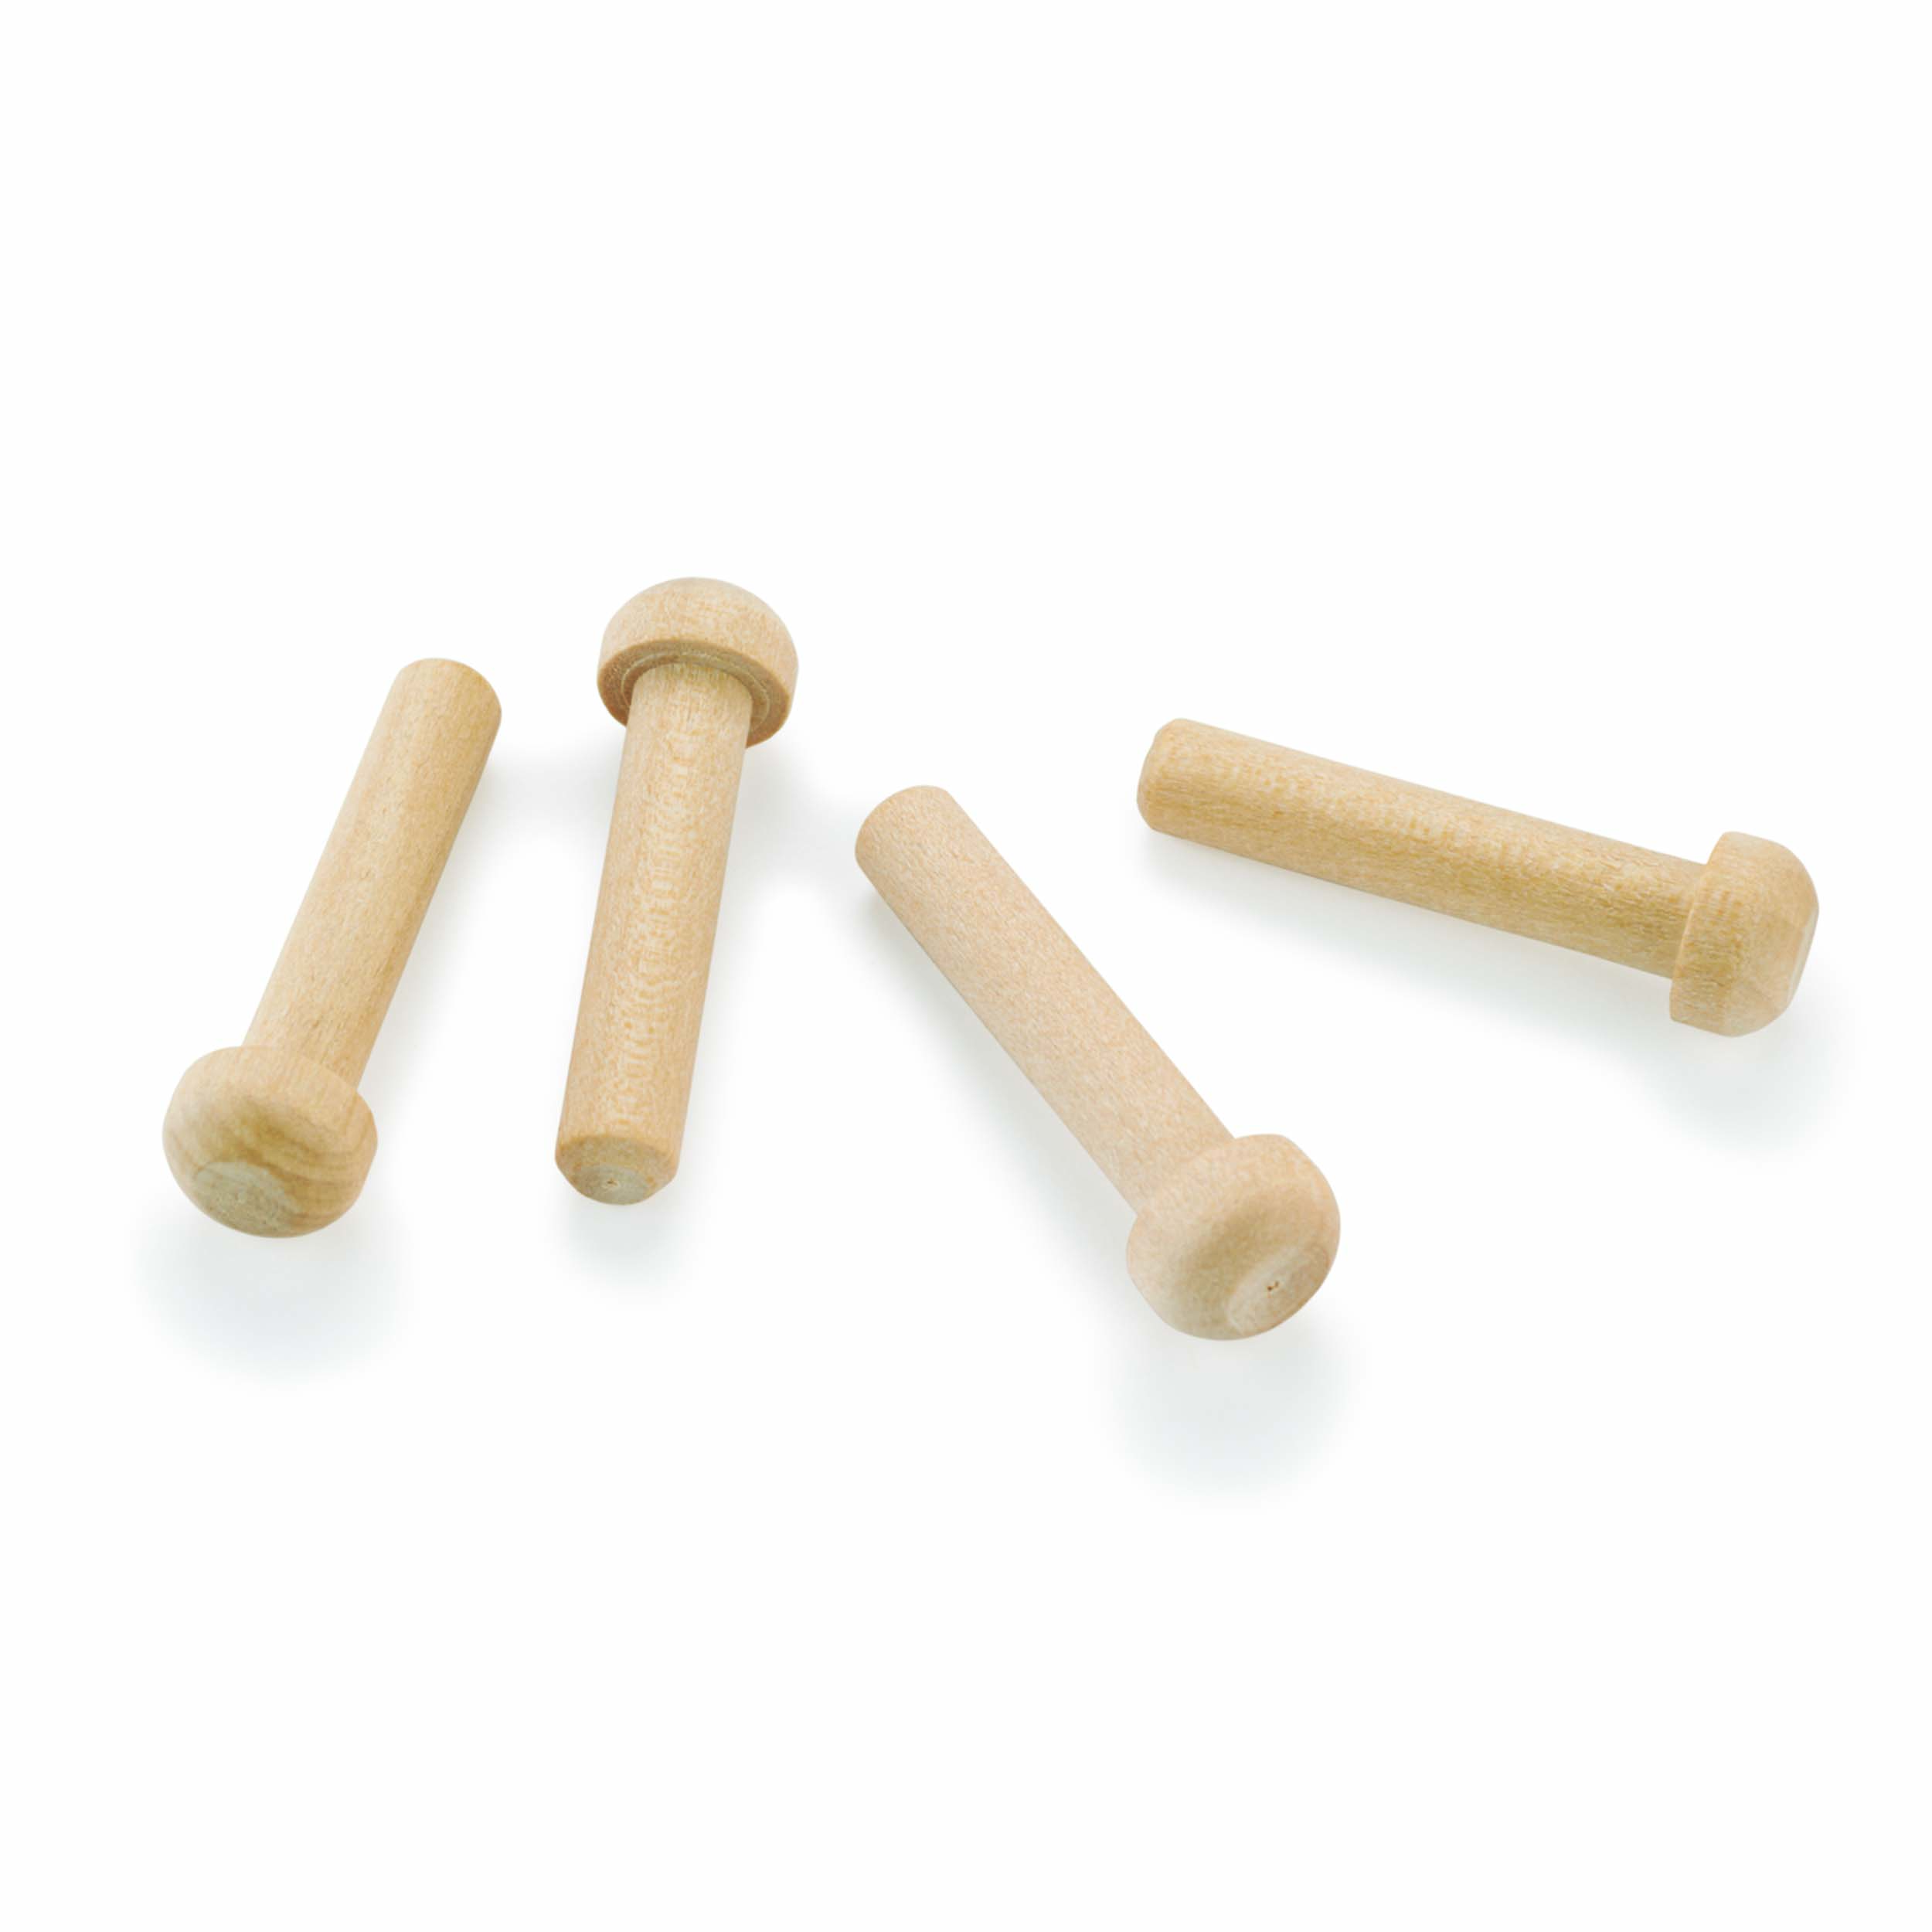 Axle Pegs 7/32 Diameter x 1-3/16 Long, Maple 8-piece